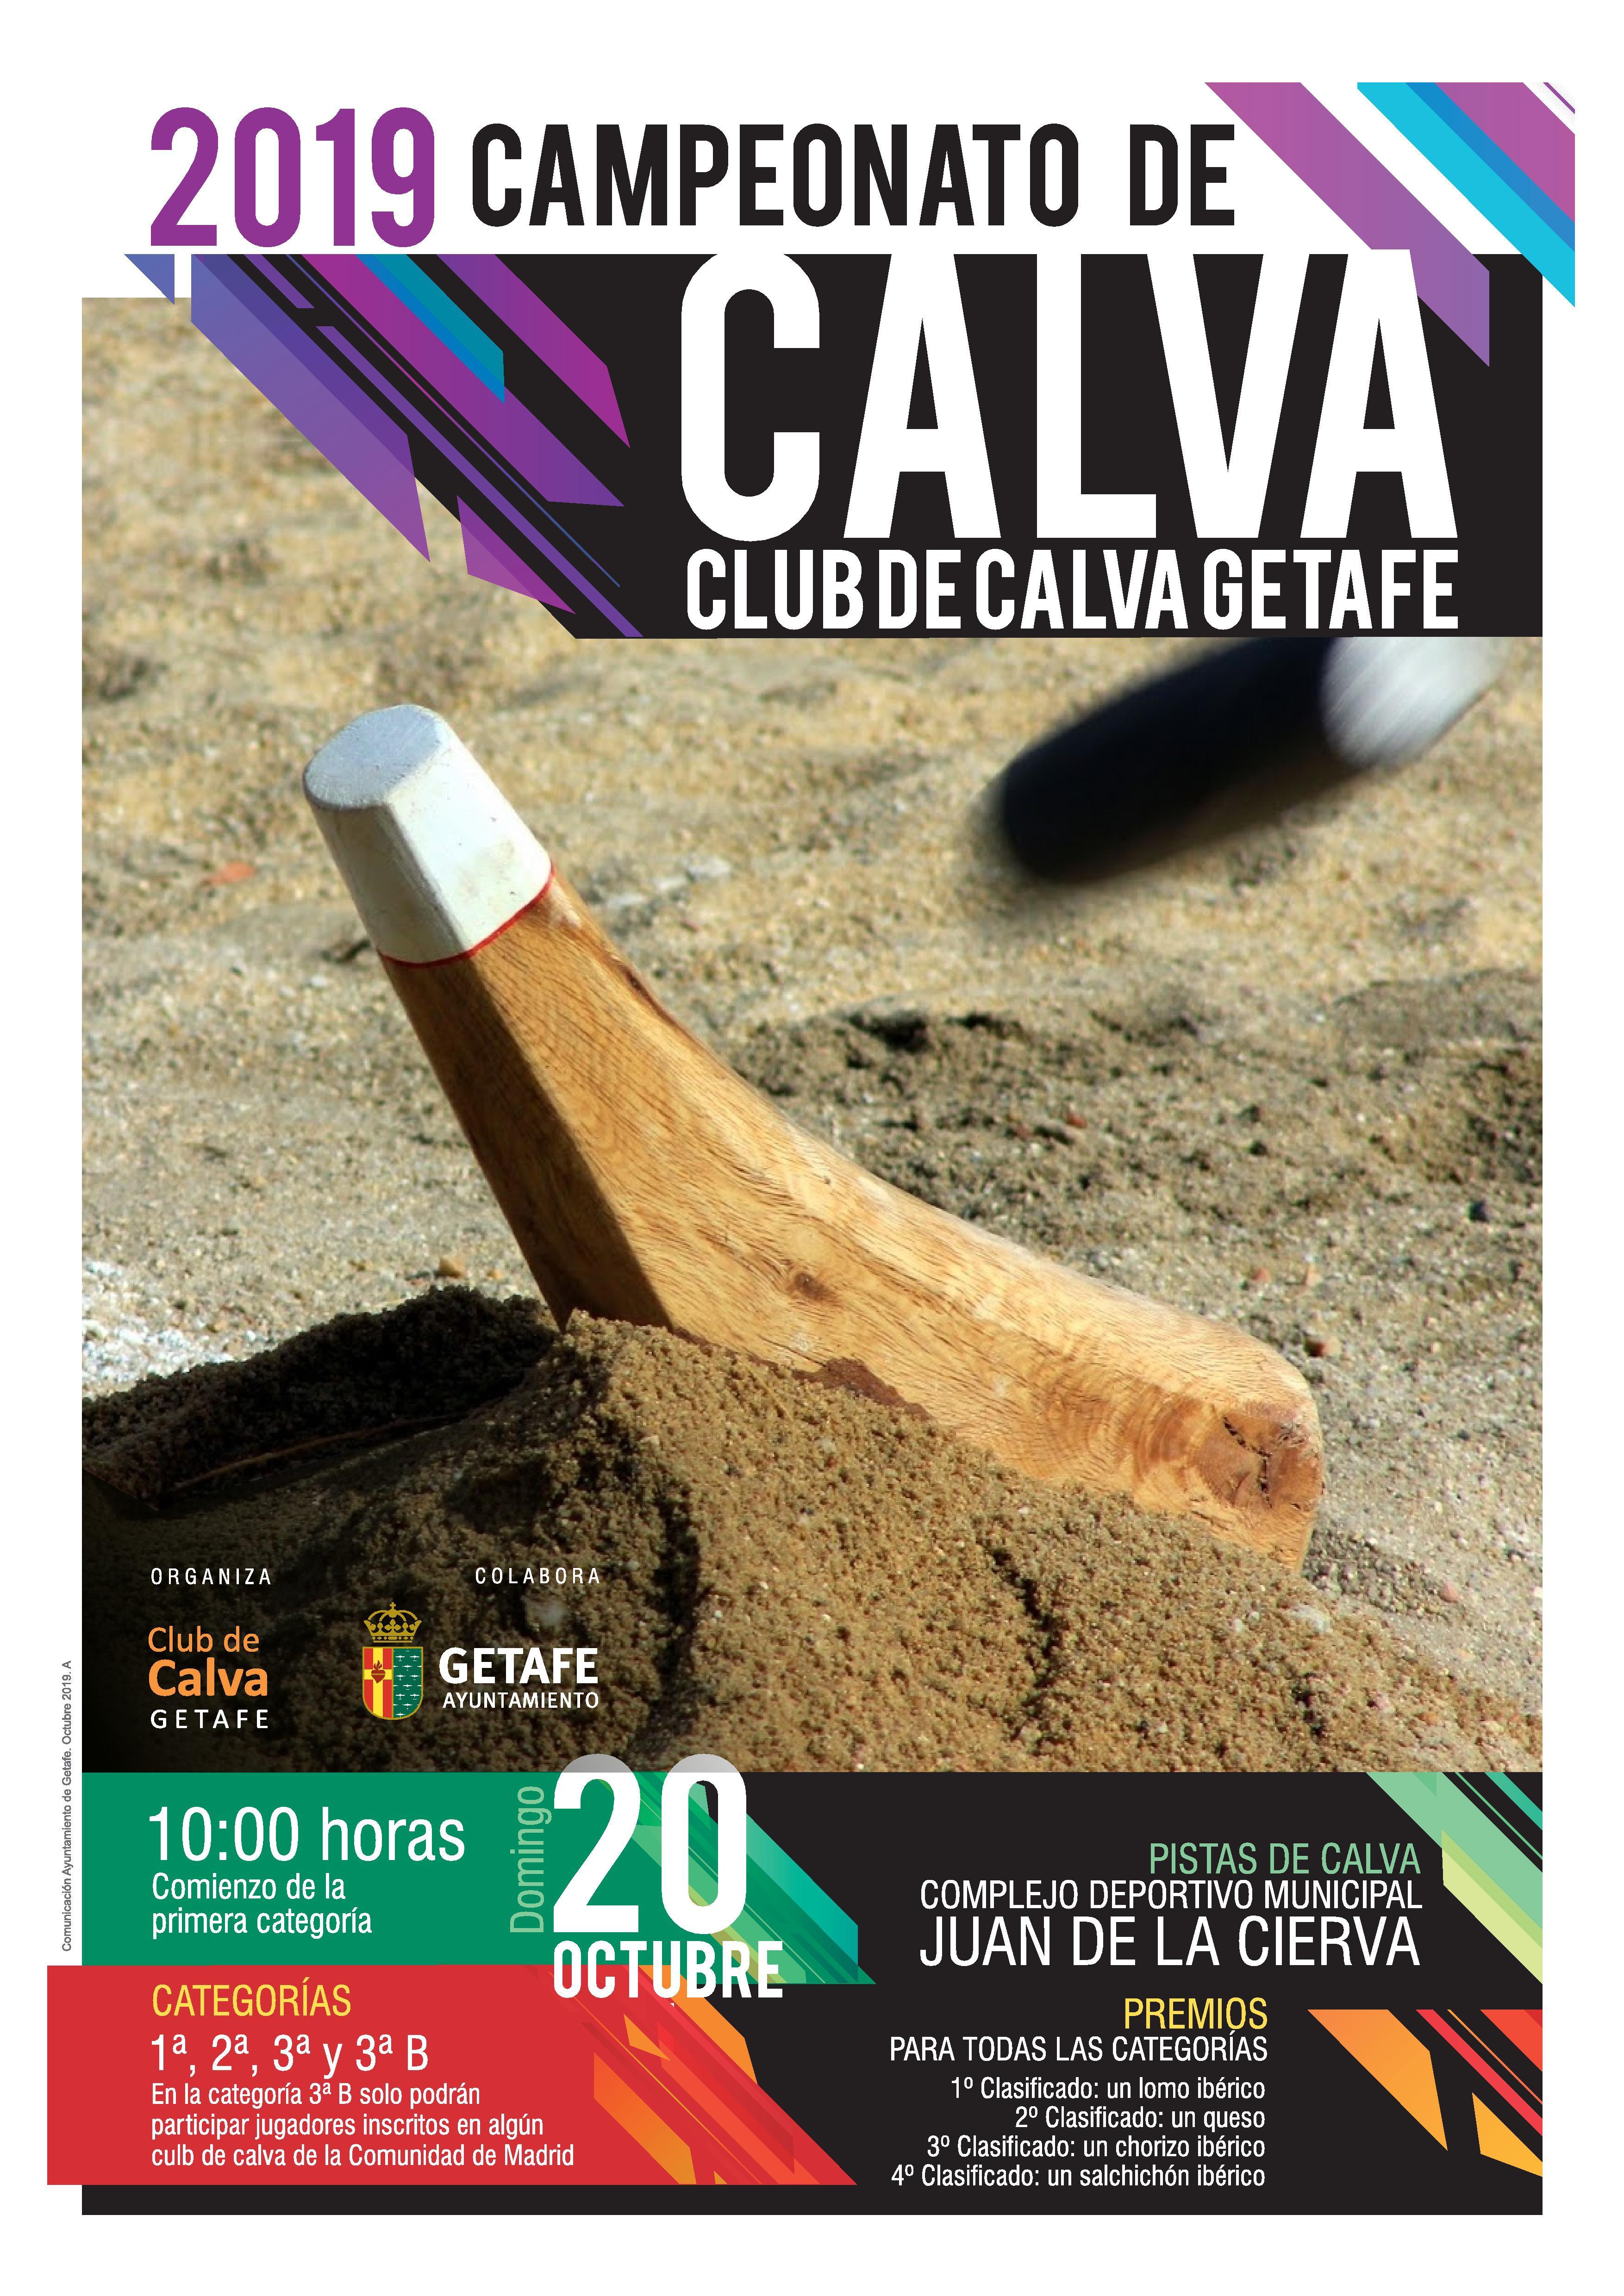 "Campeonato de Calva ""Club Calva Getafe"" 2019"